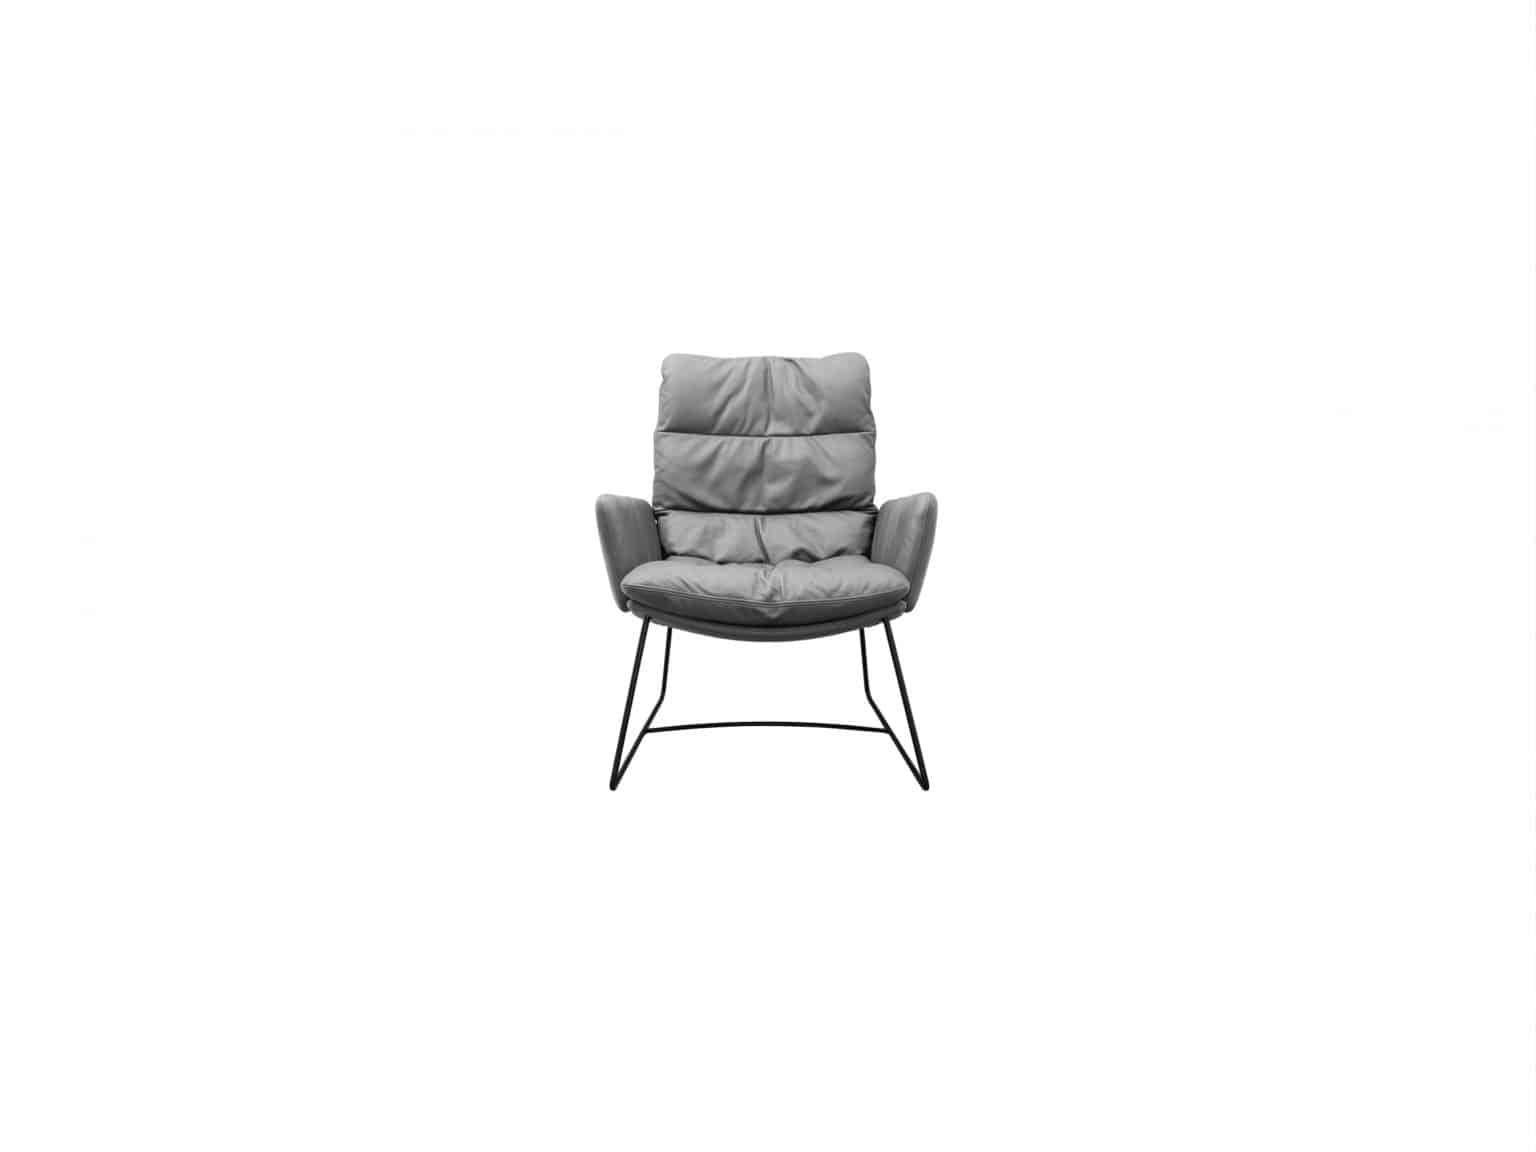 KFF fauteuil Arva lounge pa